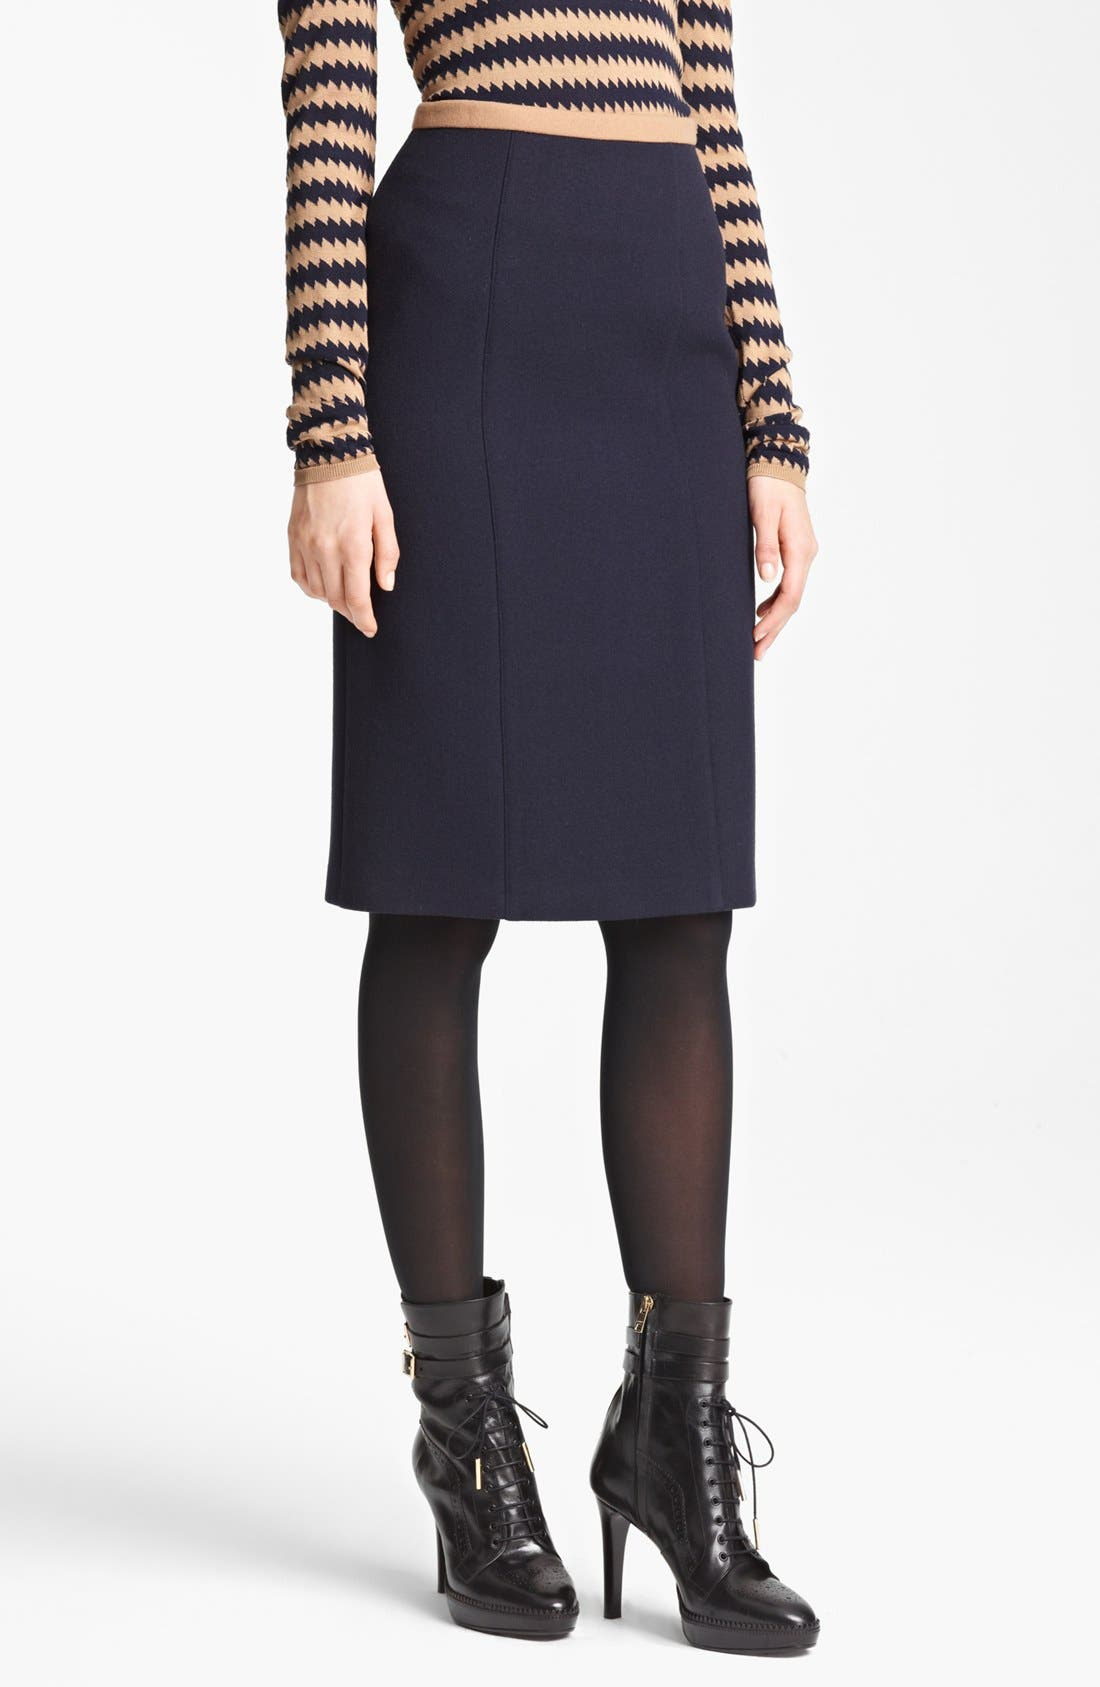 Main Image - Burberry Prorsum Contrast Waist Skirt